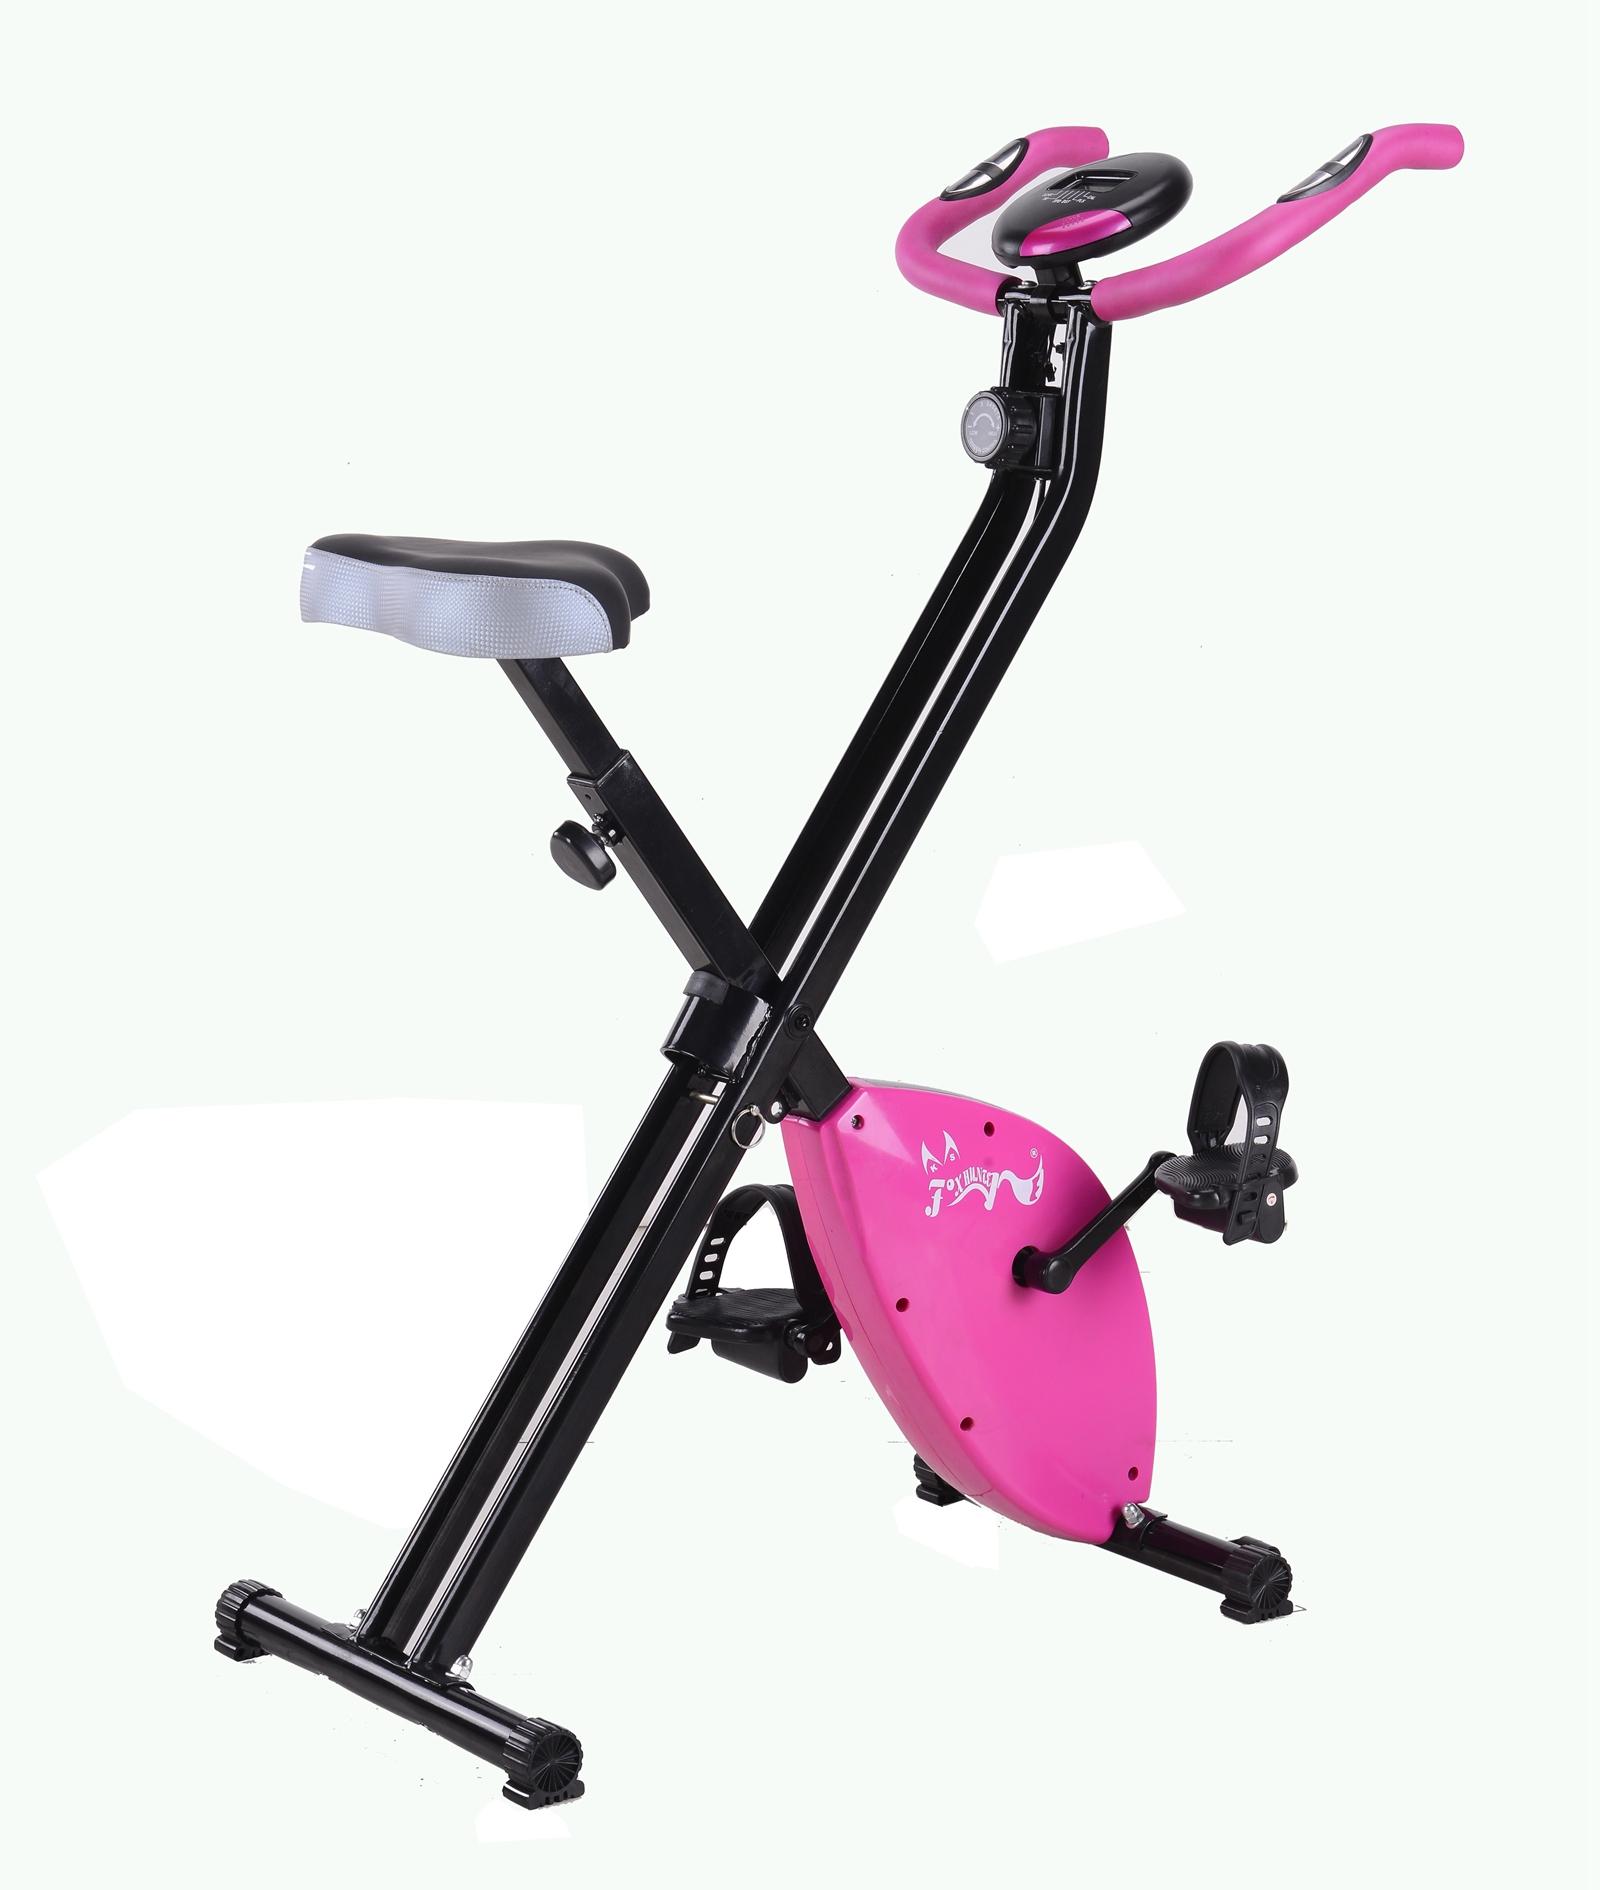 foxhunter roseo v lo d 39 exercice pliable magn tique bicyclette en forme x cardio ebay. Black Bedroom Furniture Sets. Home Design Ideas